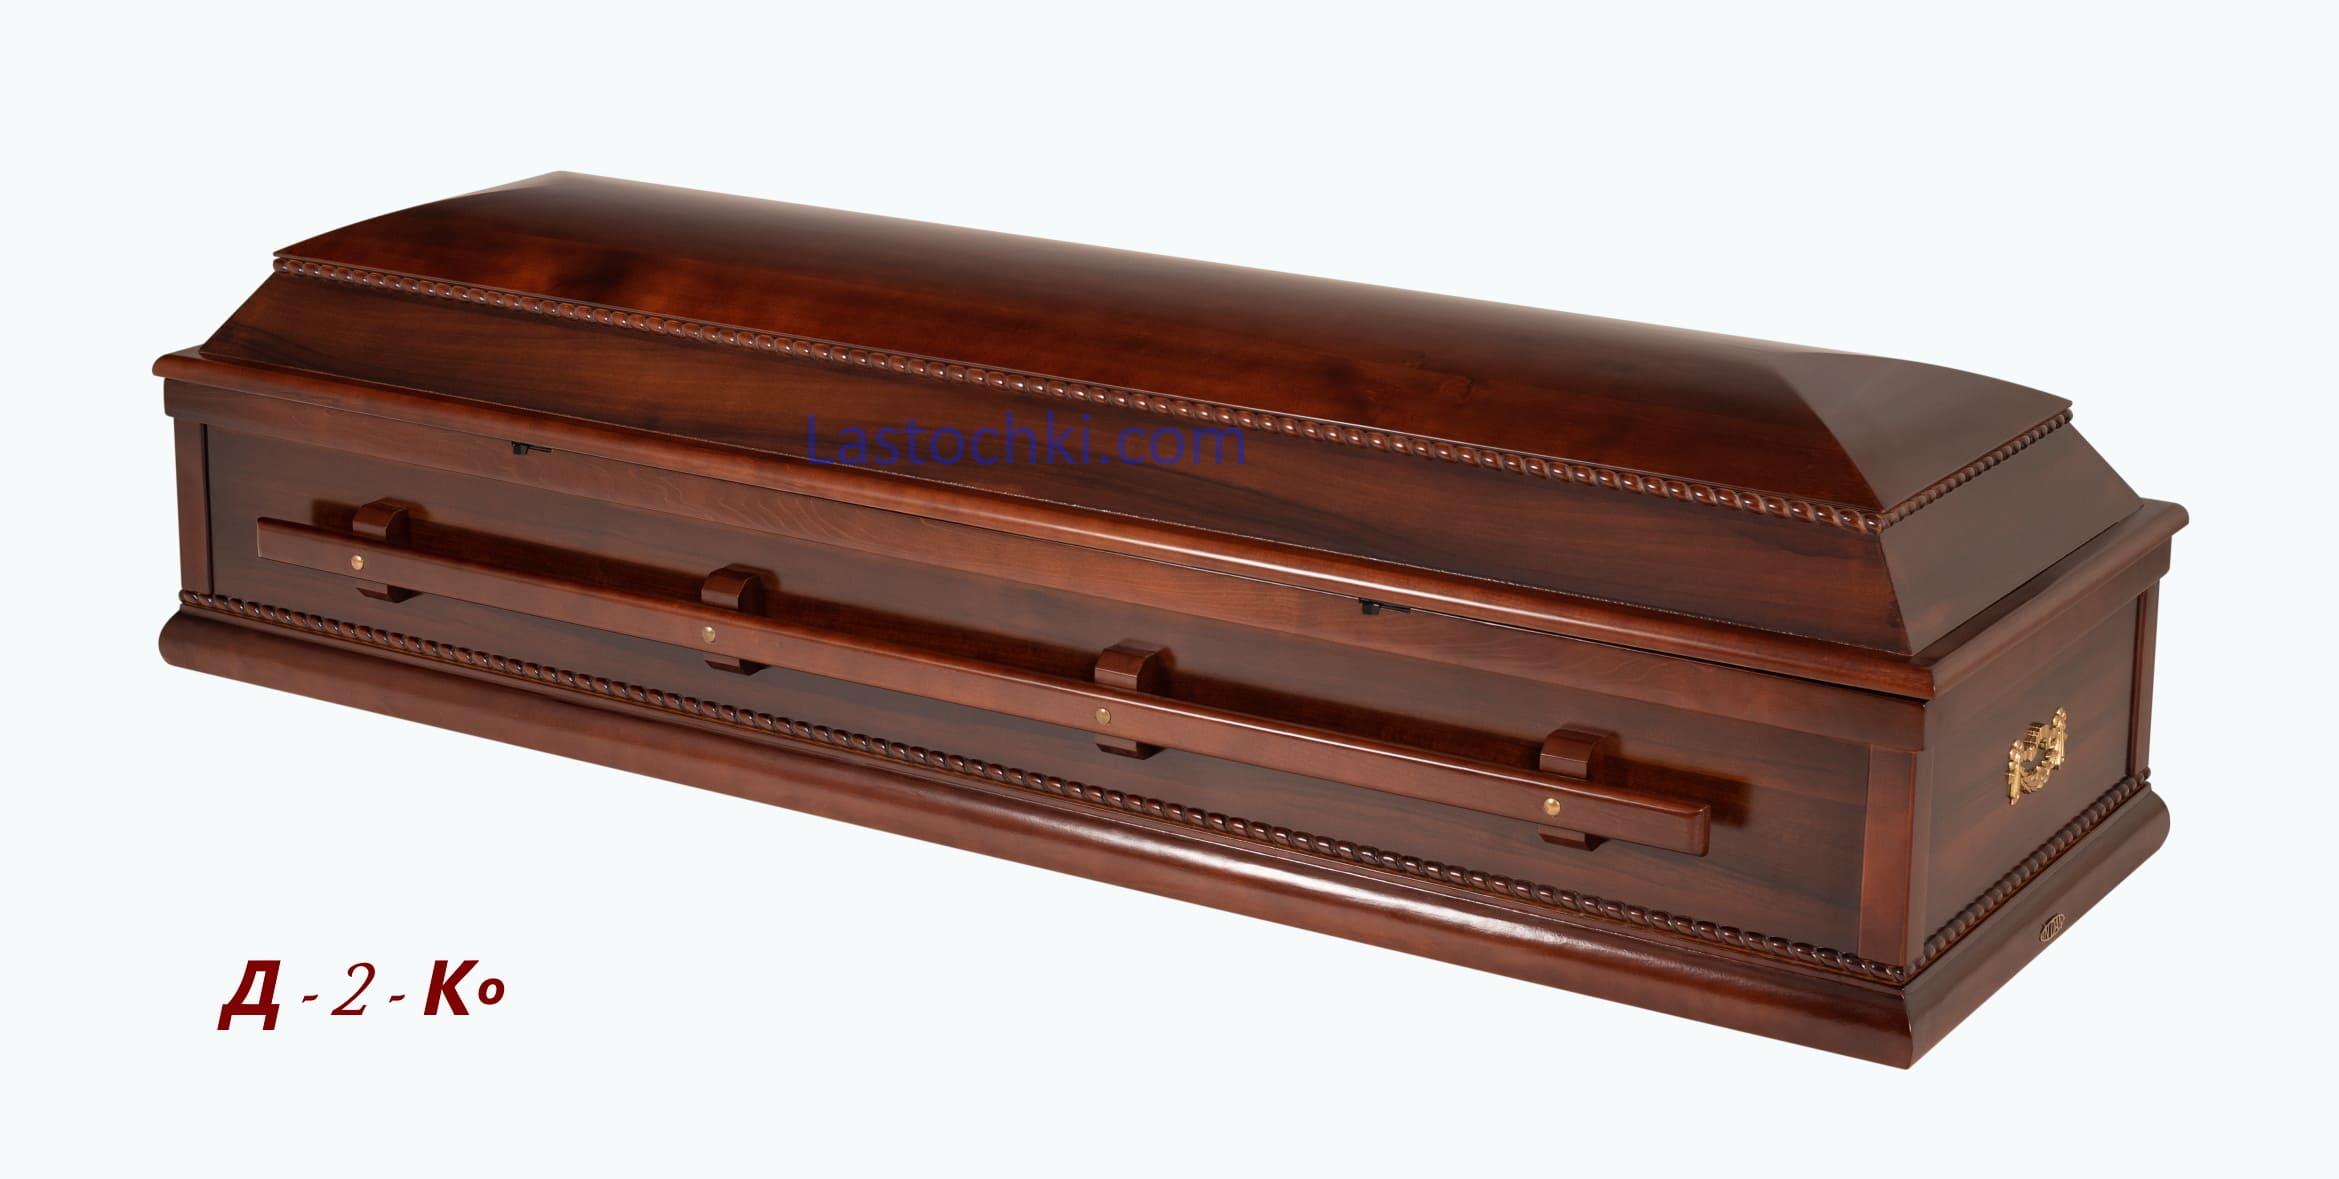 Саркофаг Д -2- К однокрышечный  Цена 21 000 грн.